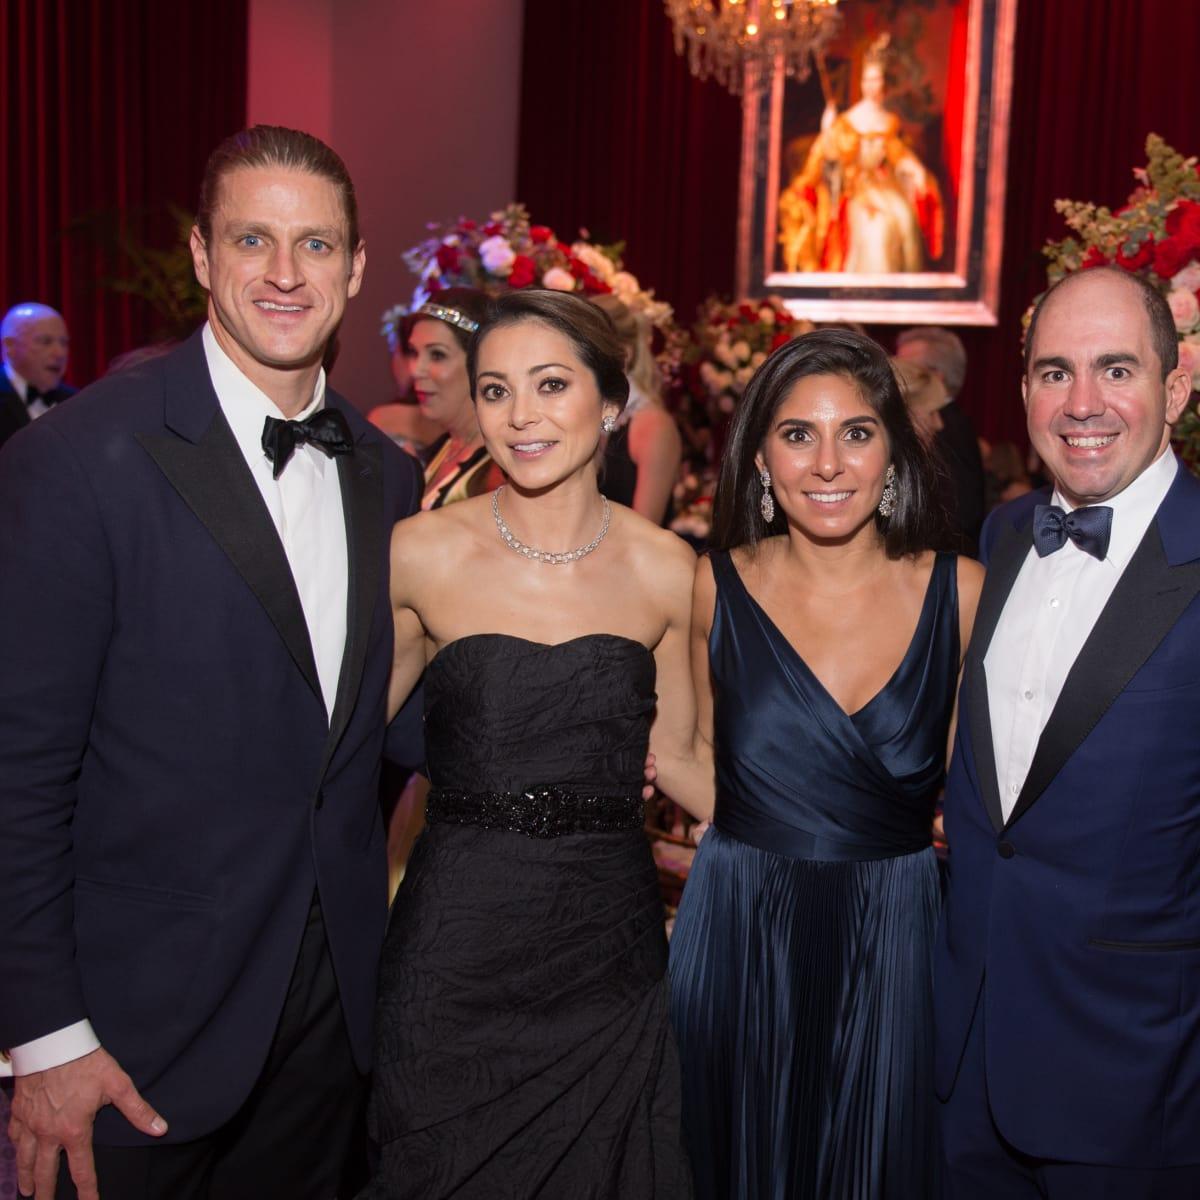 MFAH 2018 Grand Gala Ball